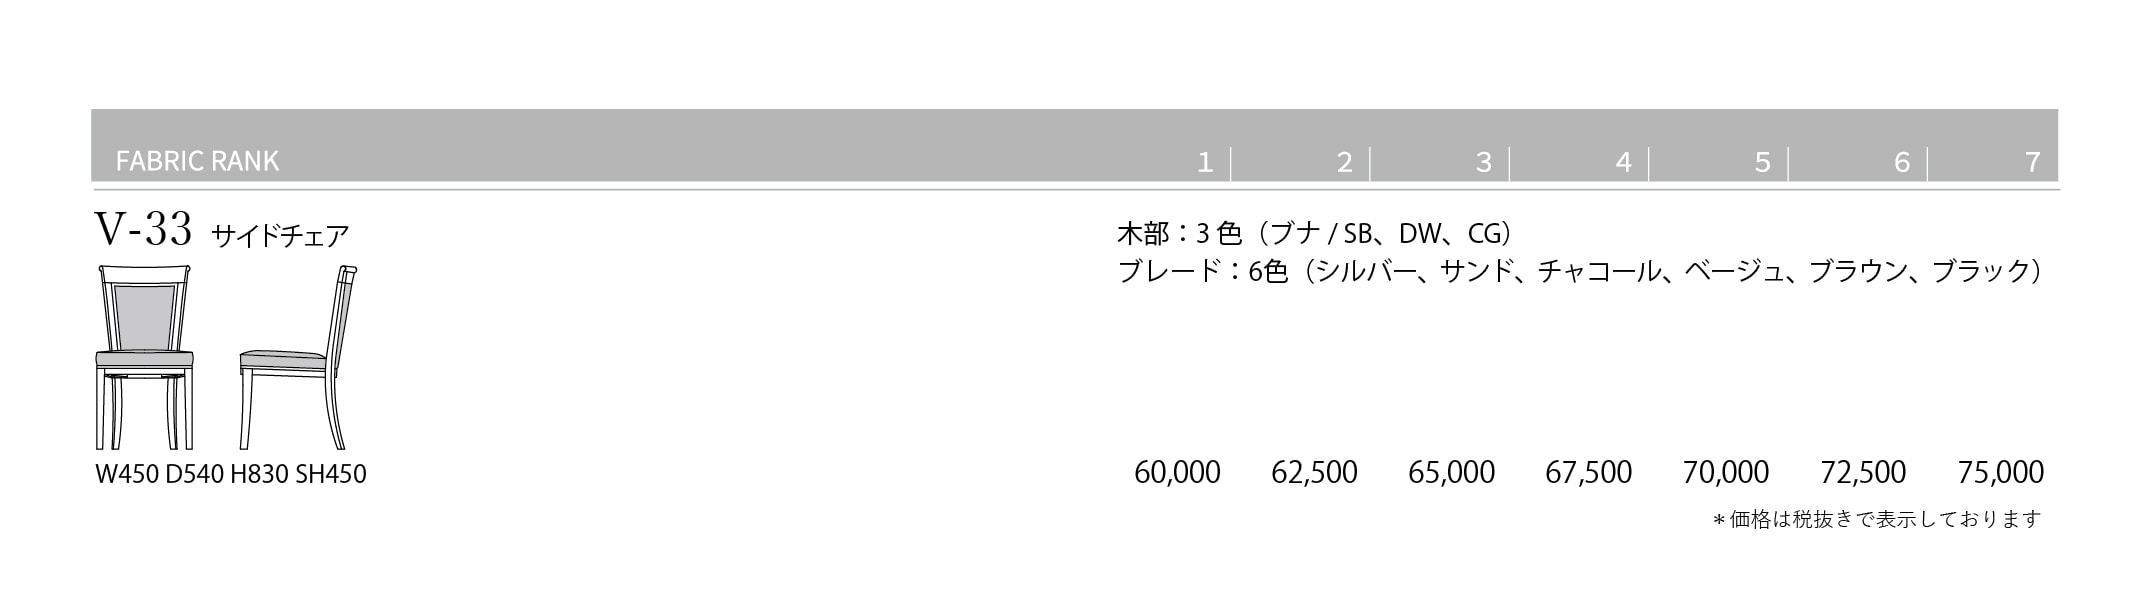 V-33 Price List